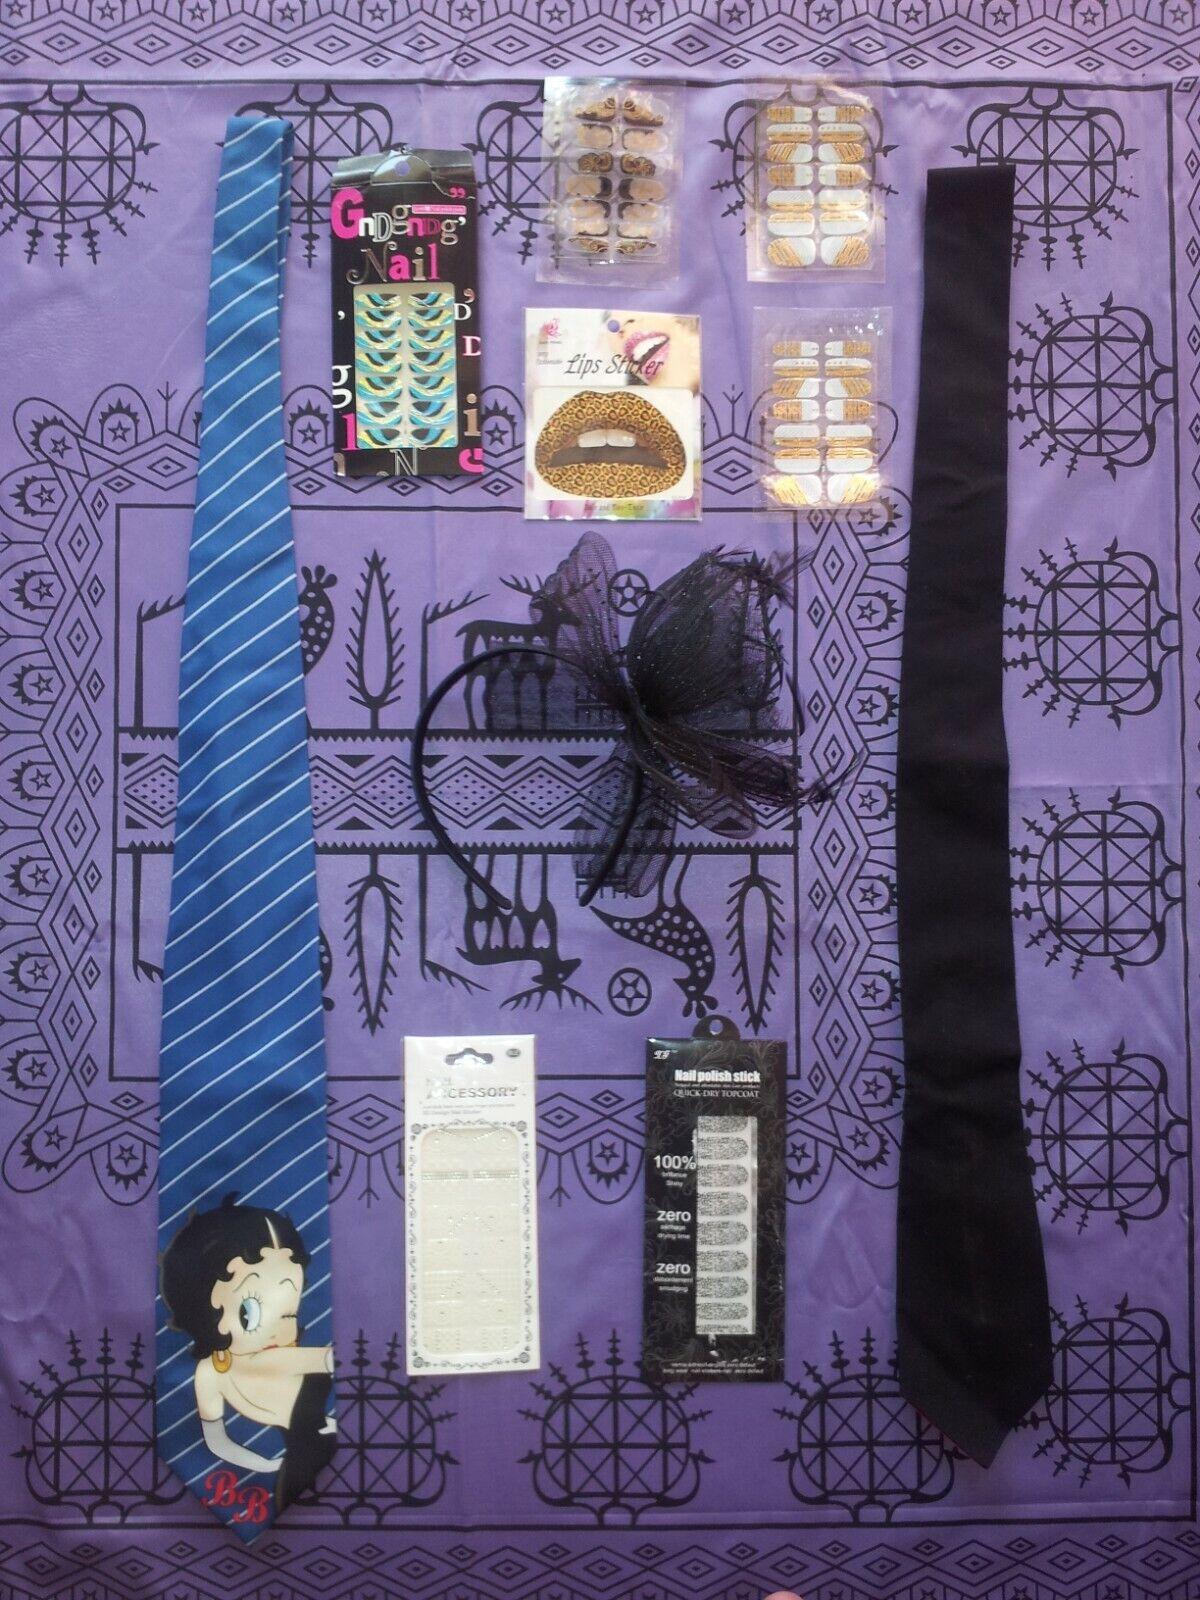 tie betty boop rare burlesque campare lolita bow nails strass sticker collective